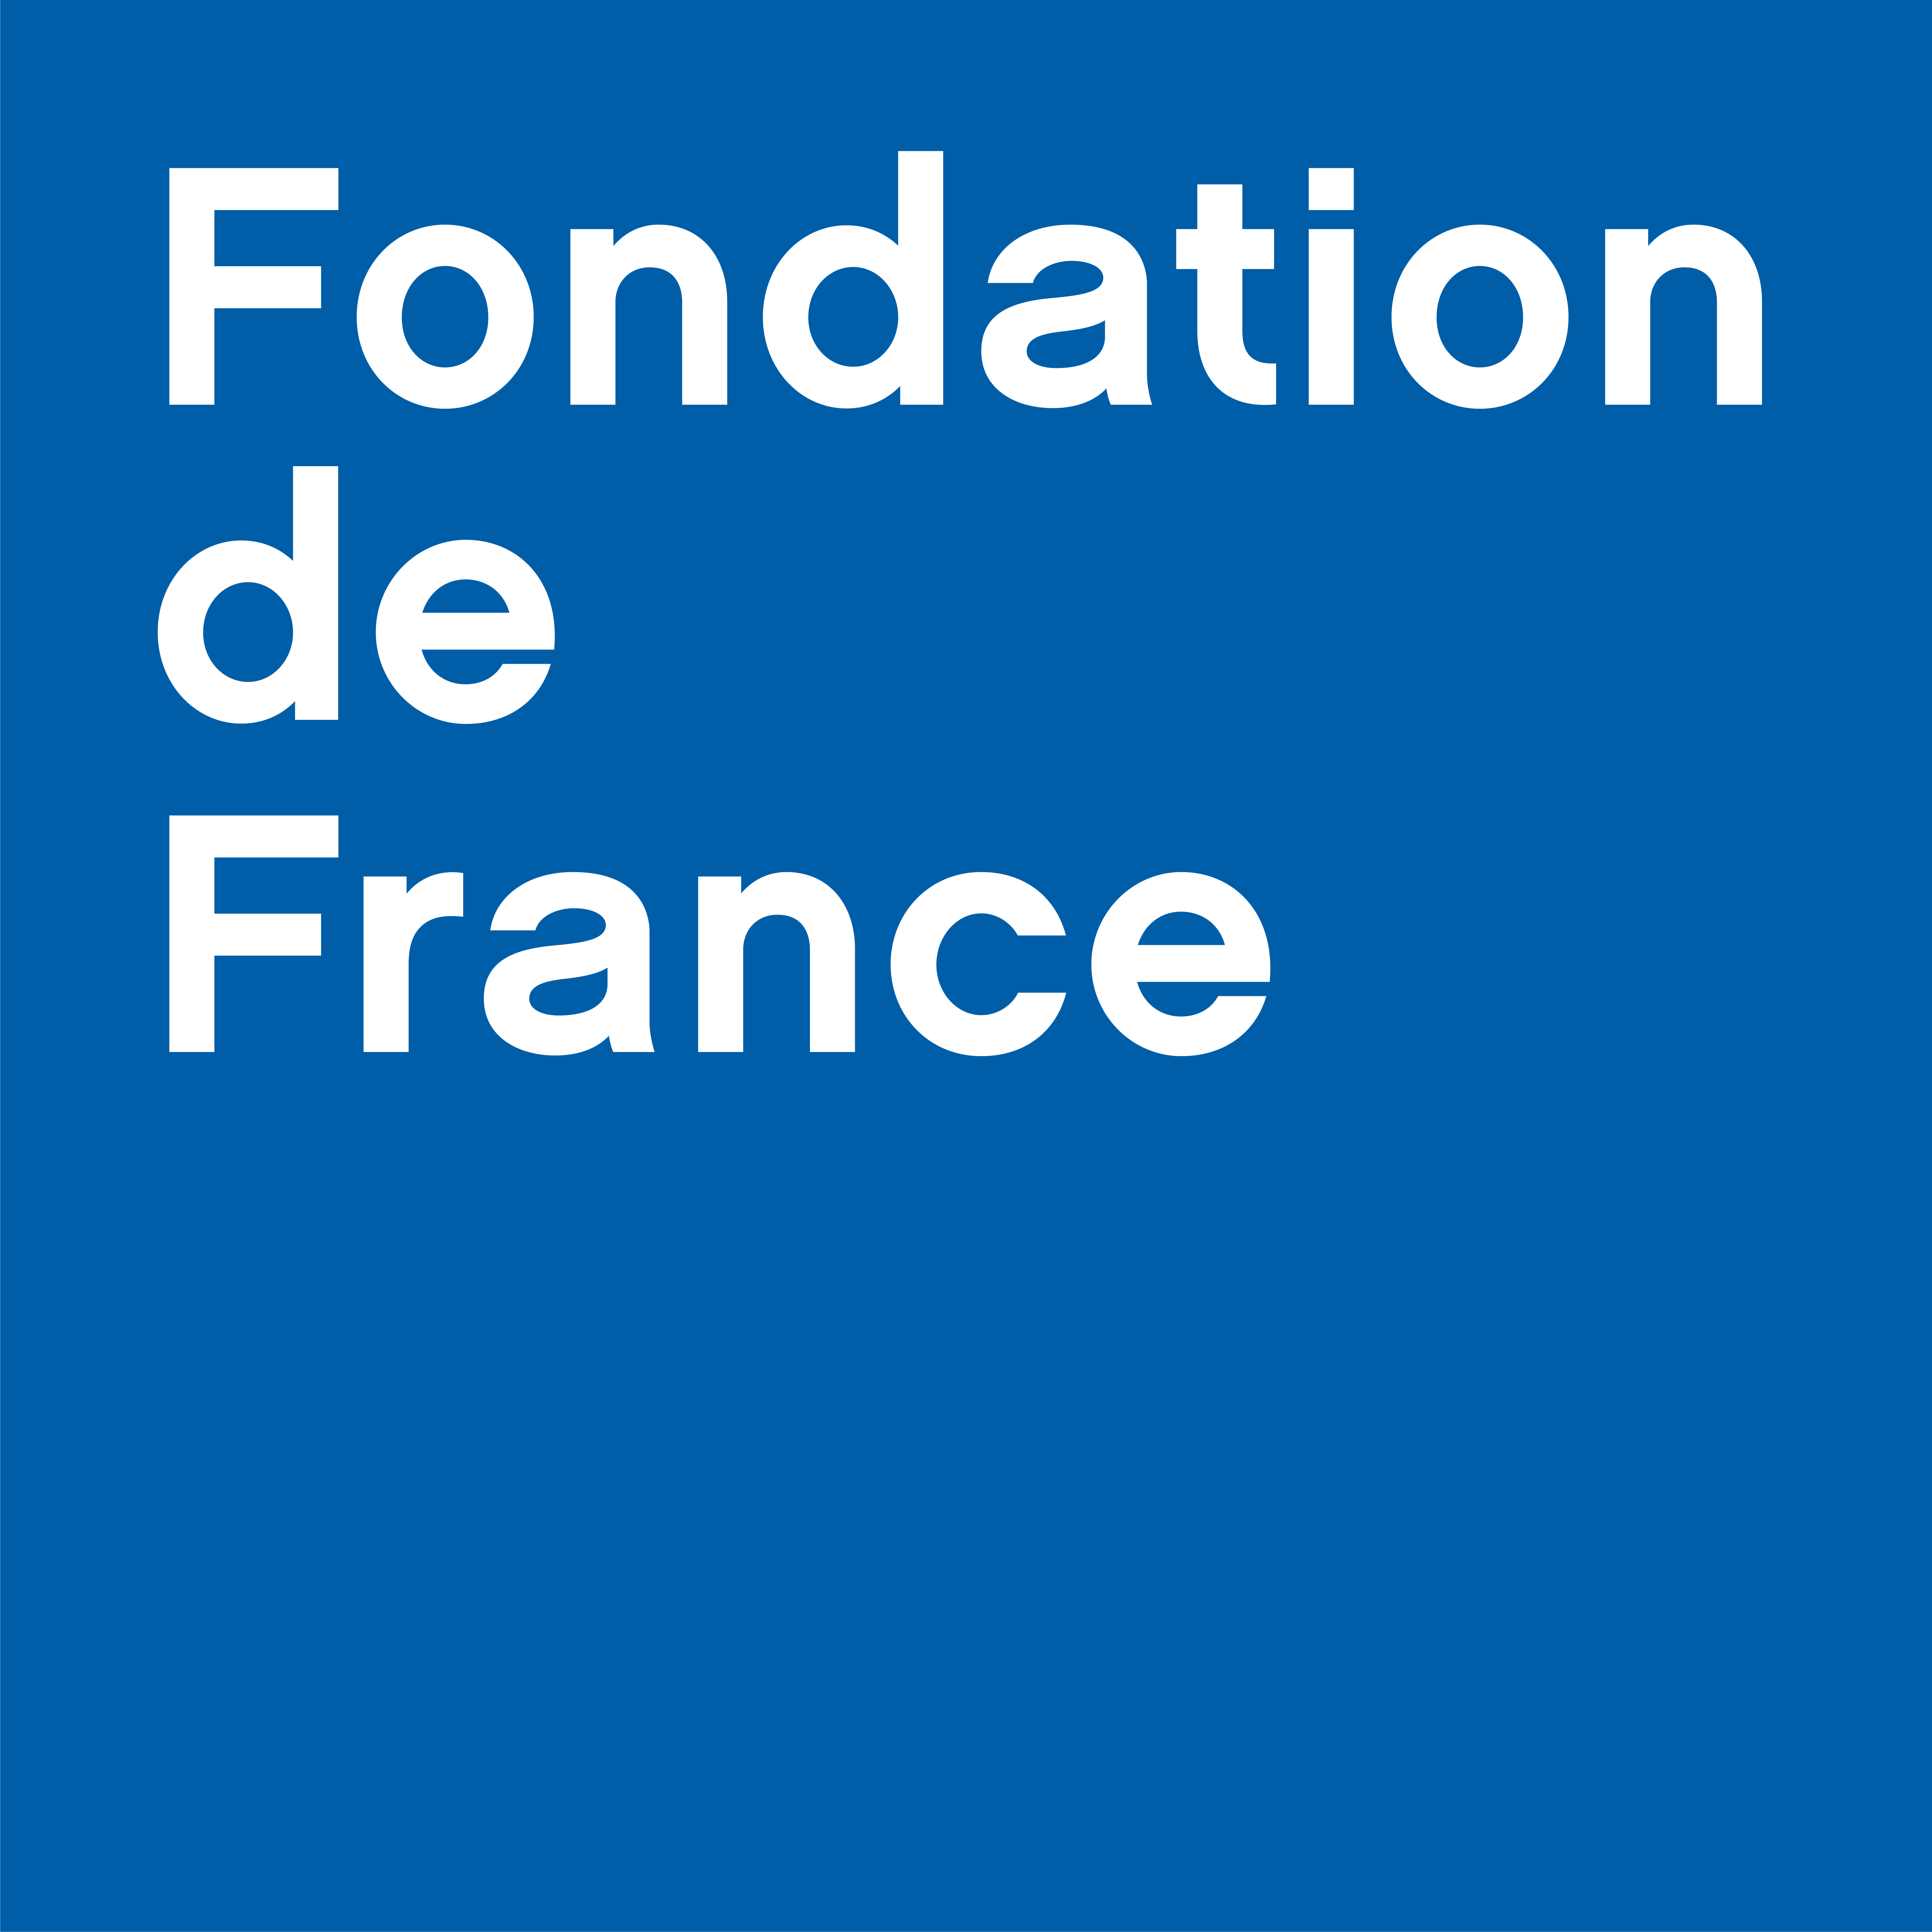 Fondation de France - Logo